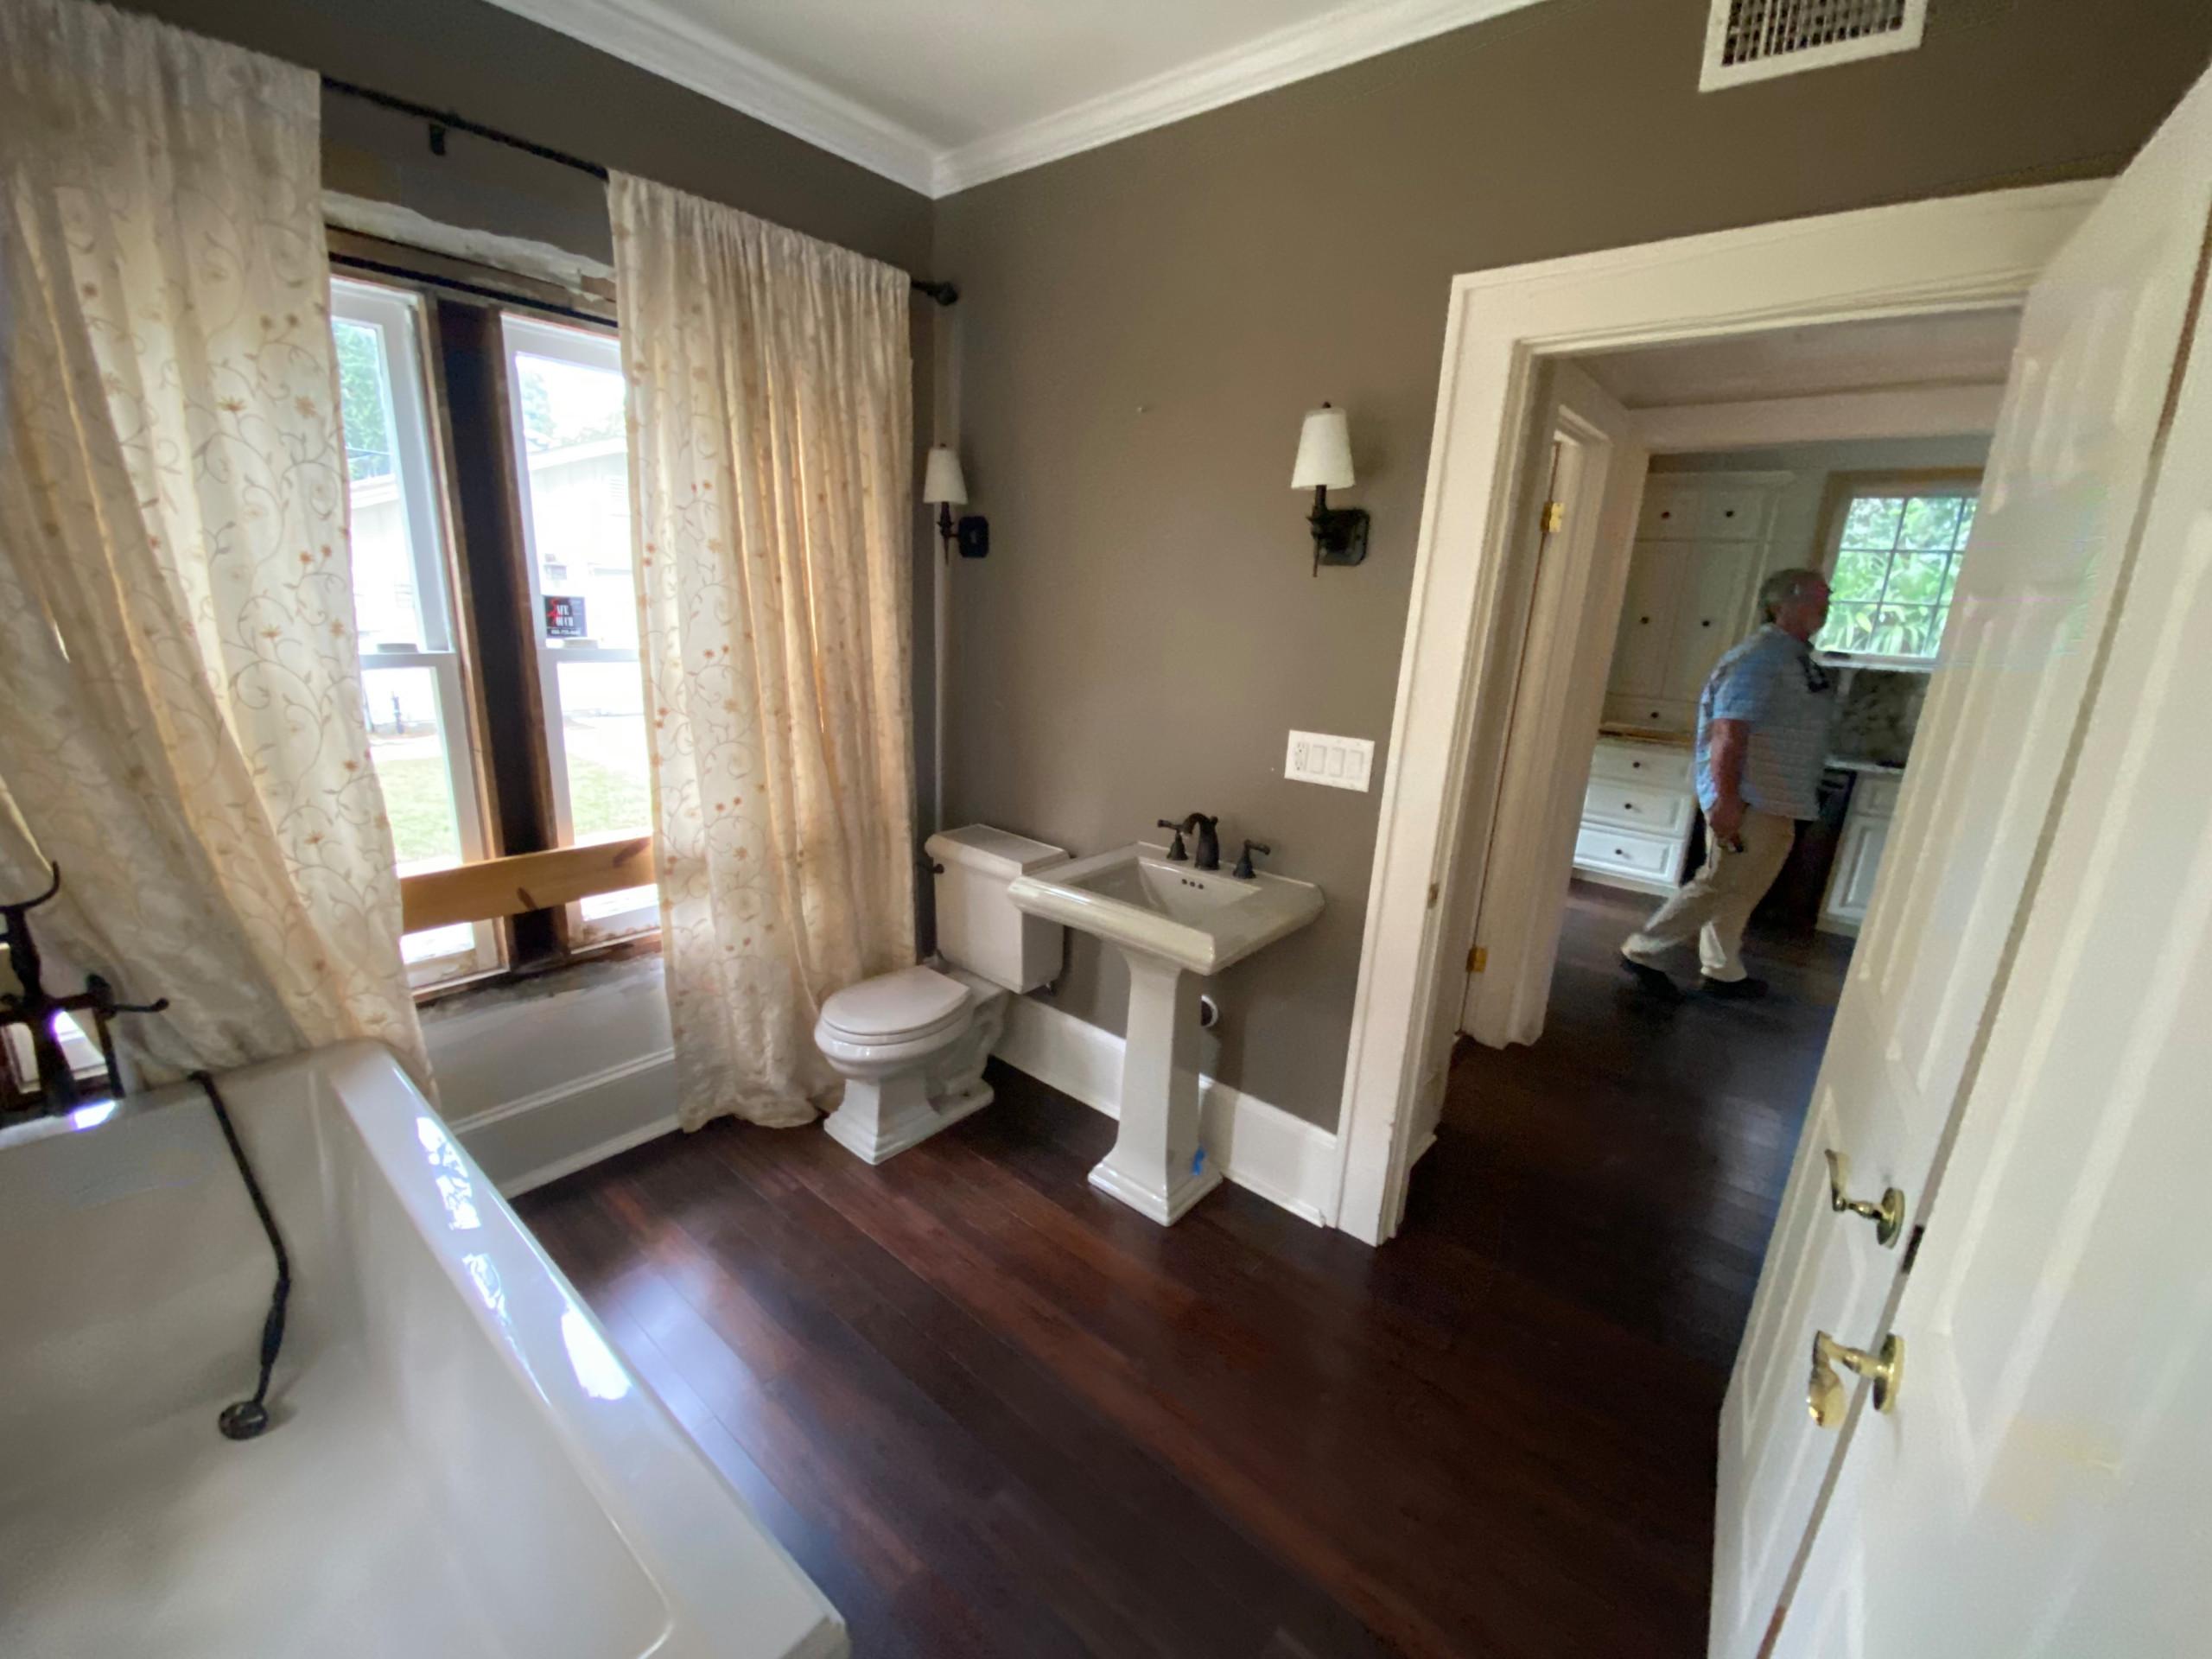 BEFORE REMODEL - Avondale Home Remodel